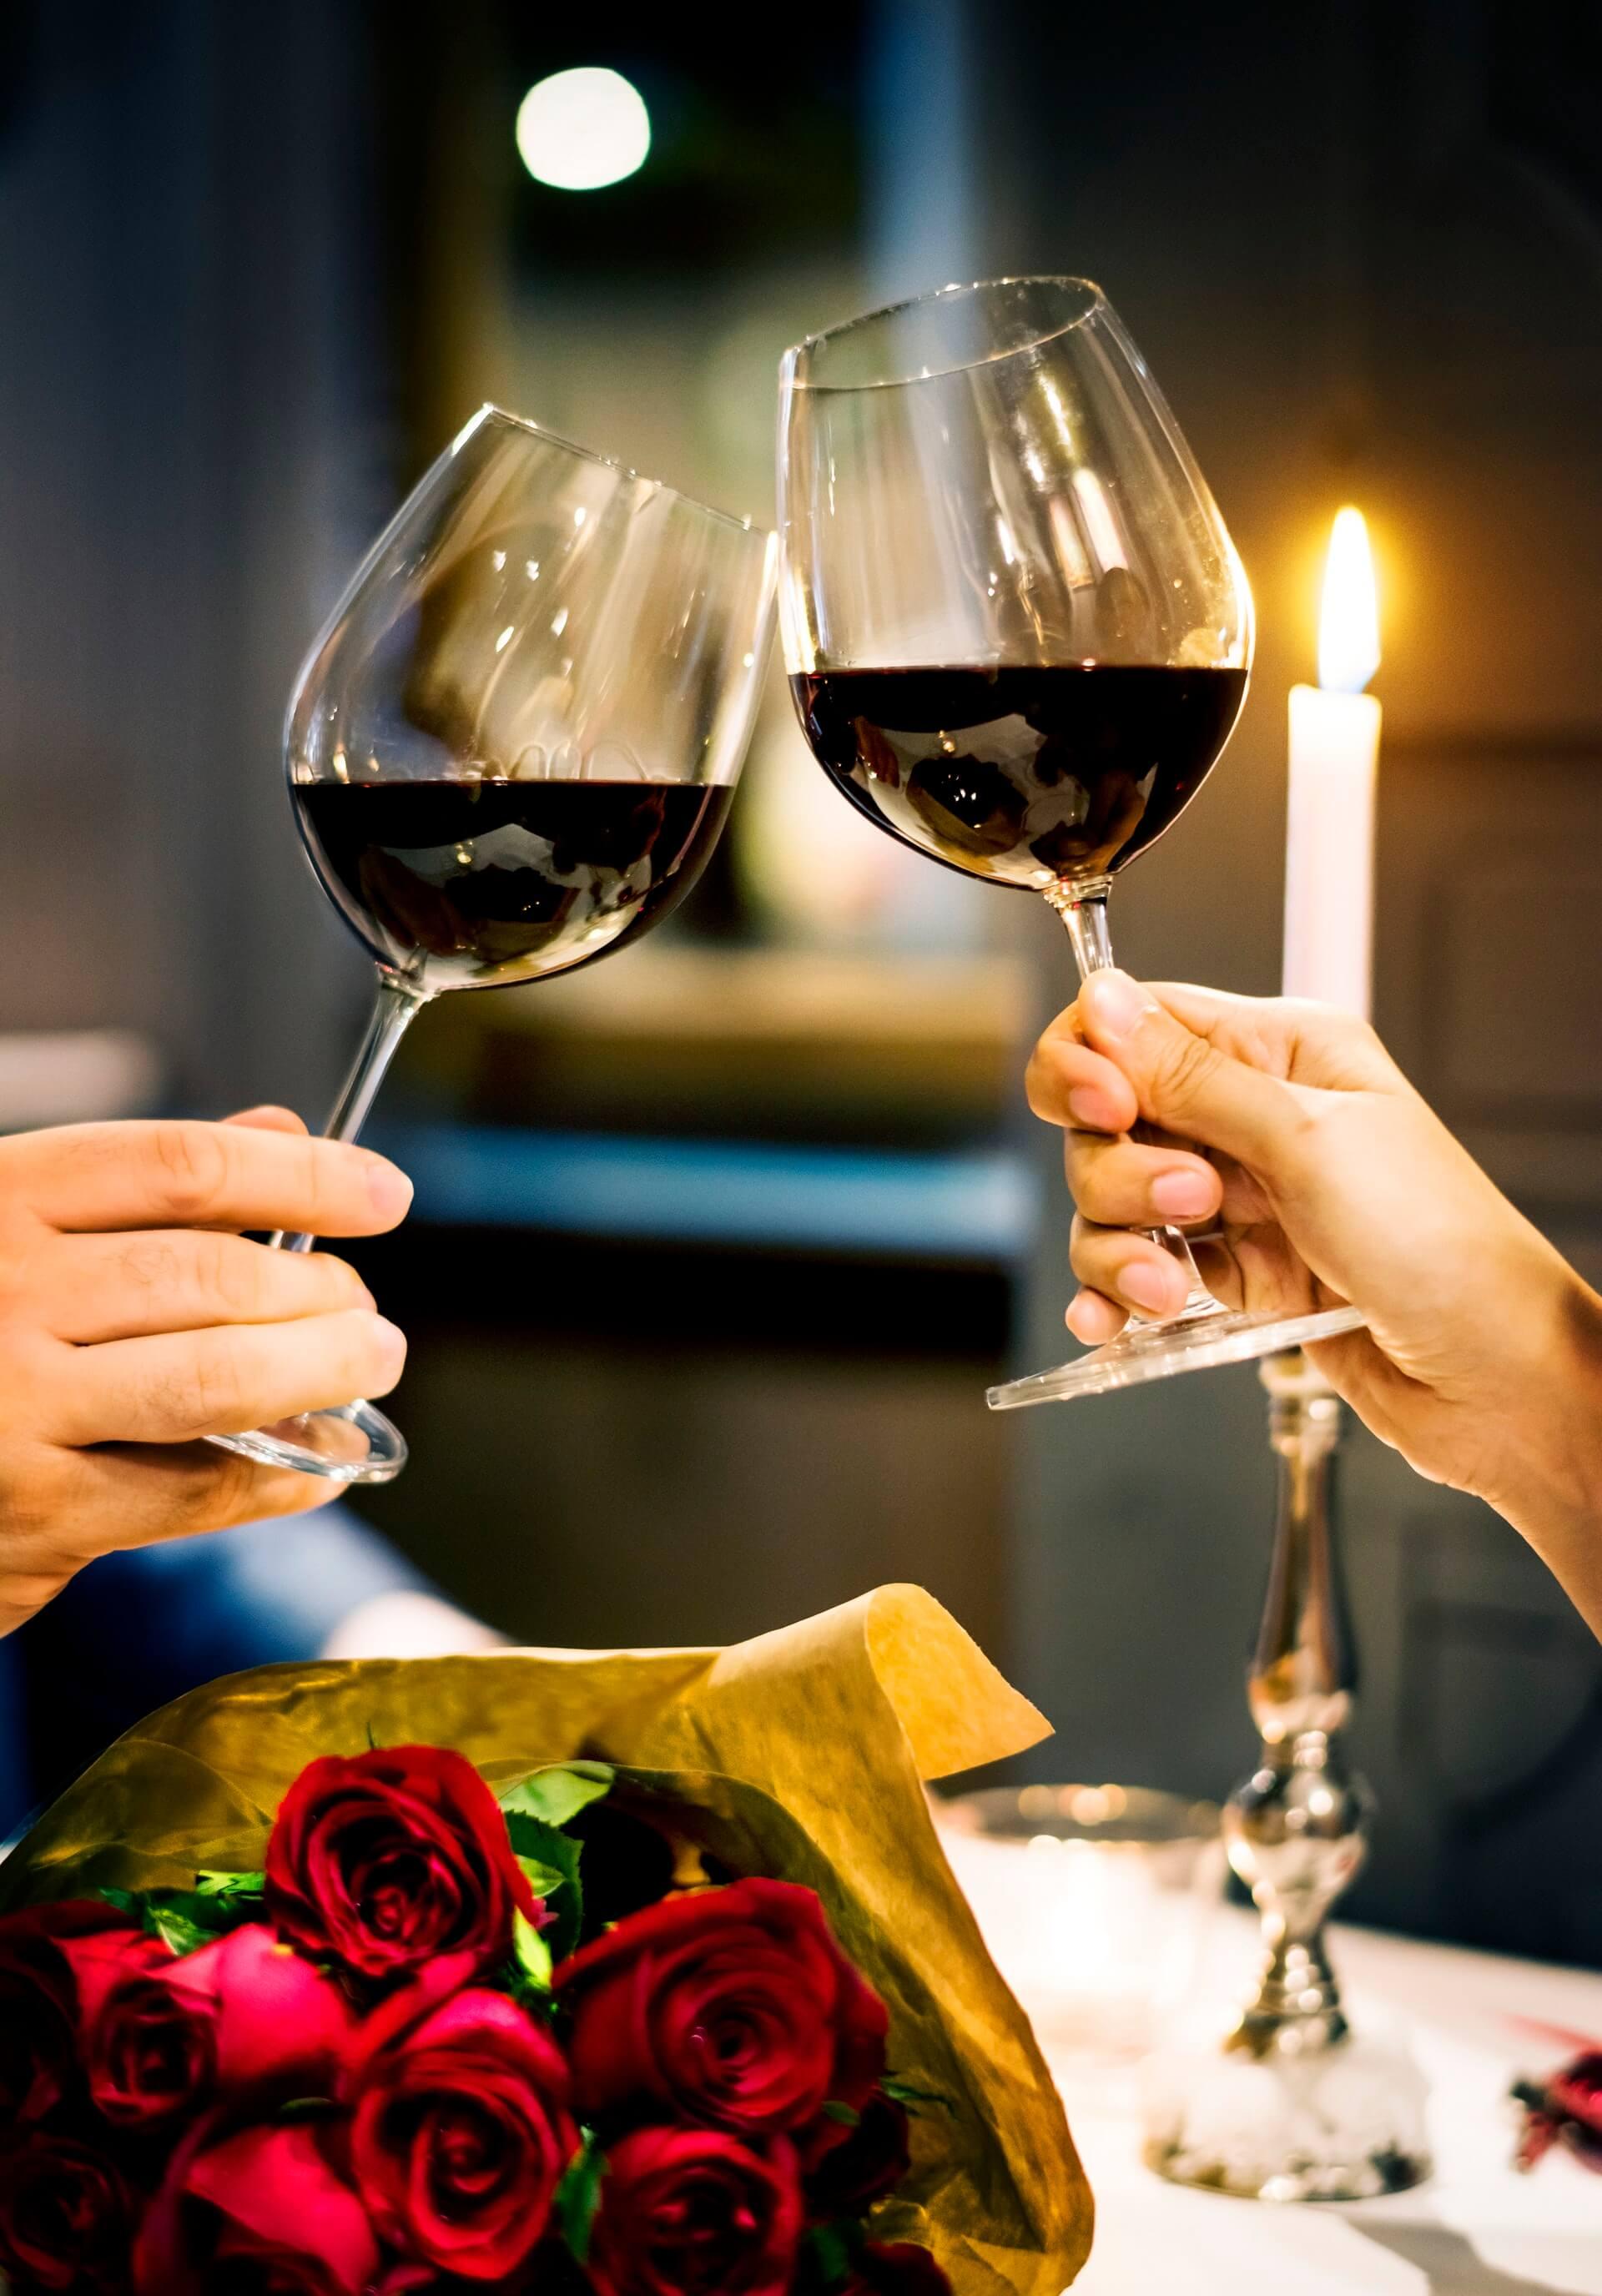 valentijnsdag cadeau inspiratie wijn